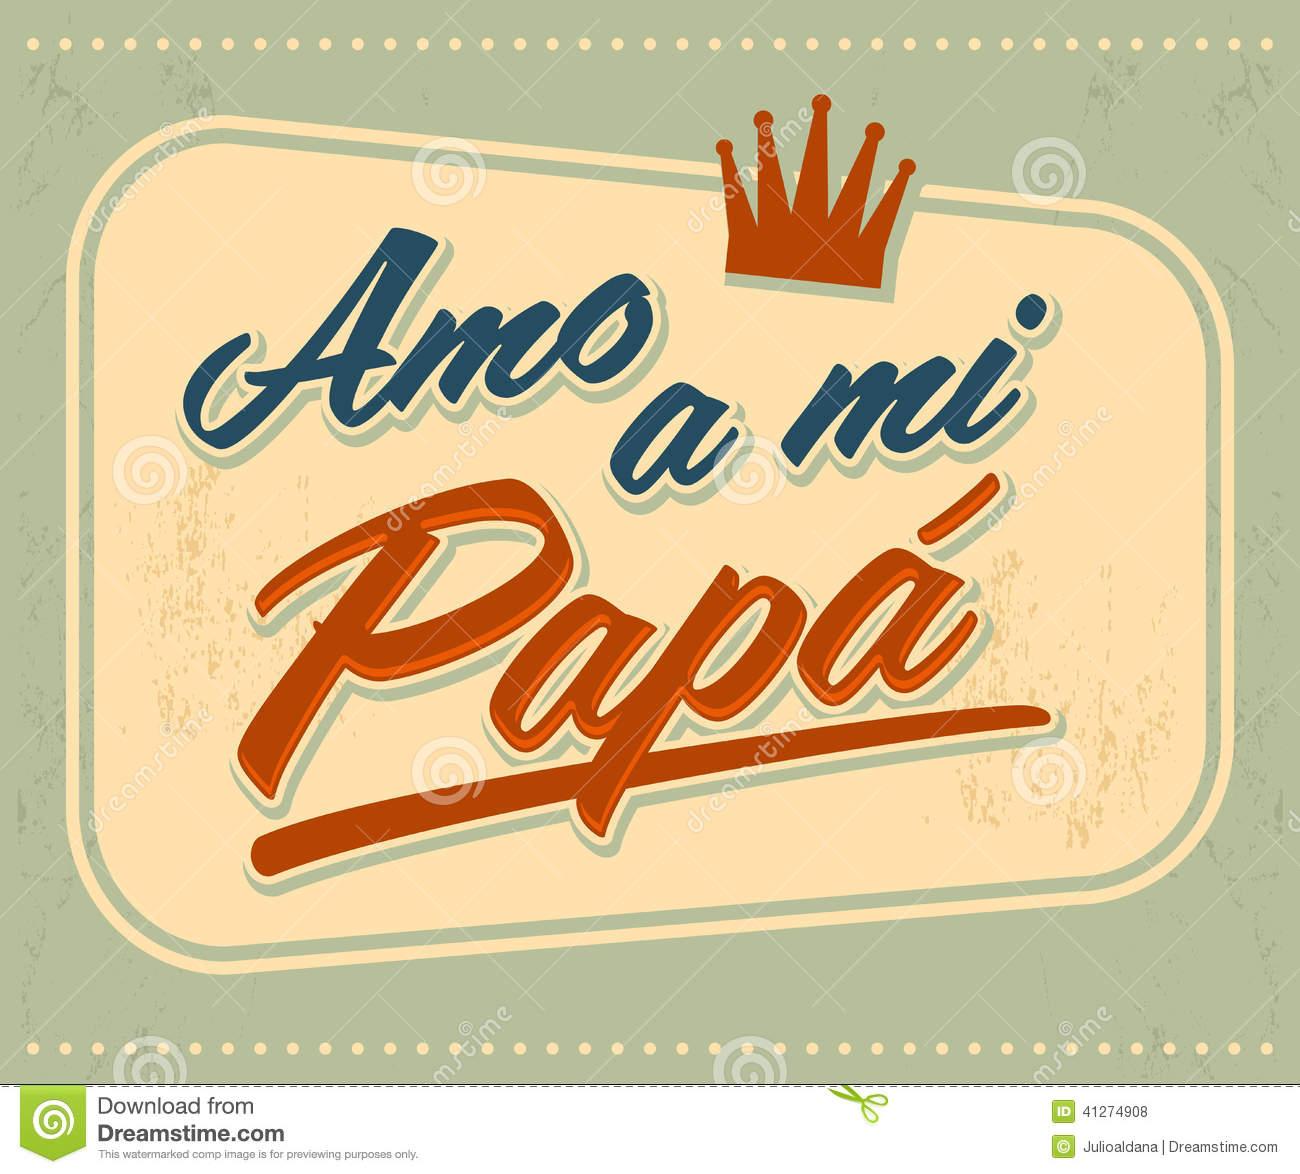 Amo a mi Papa - I Love my Dad spanish text